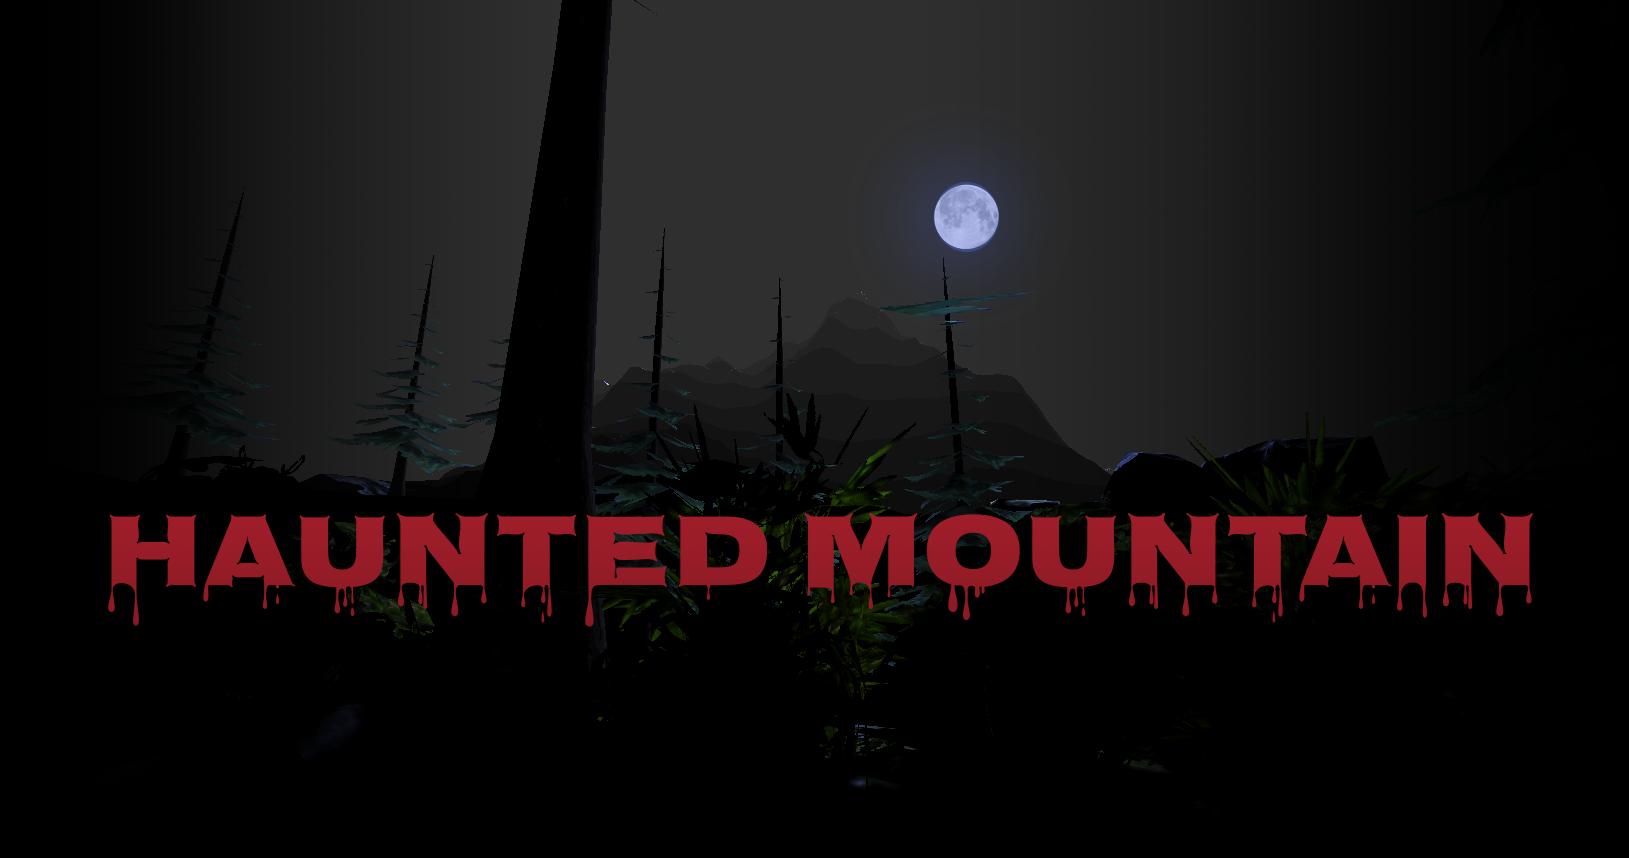 Haunted Mountain